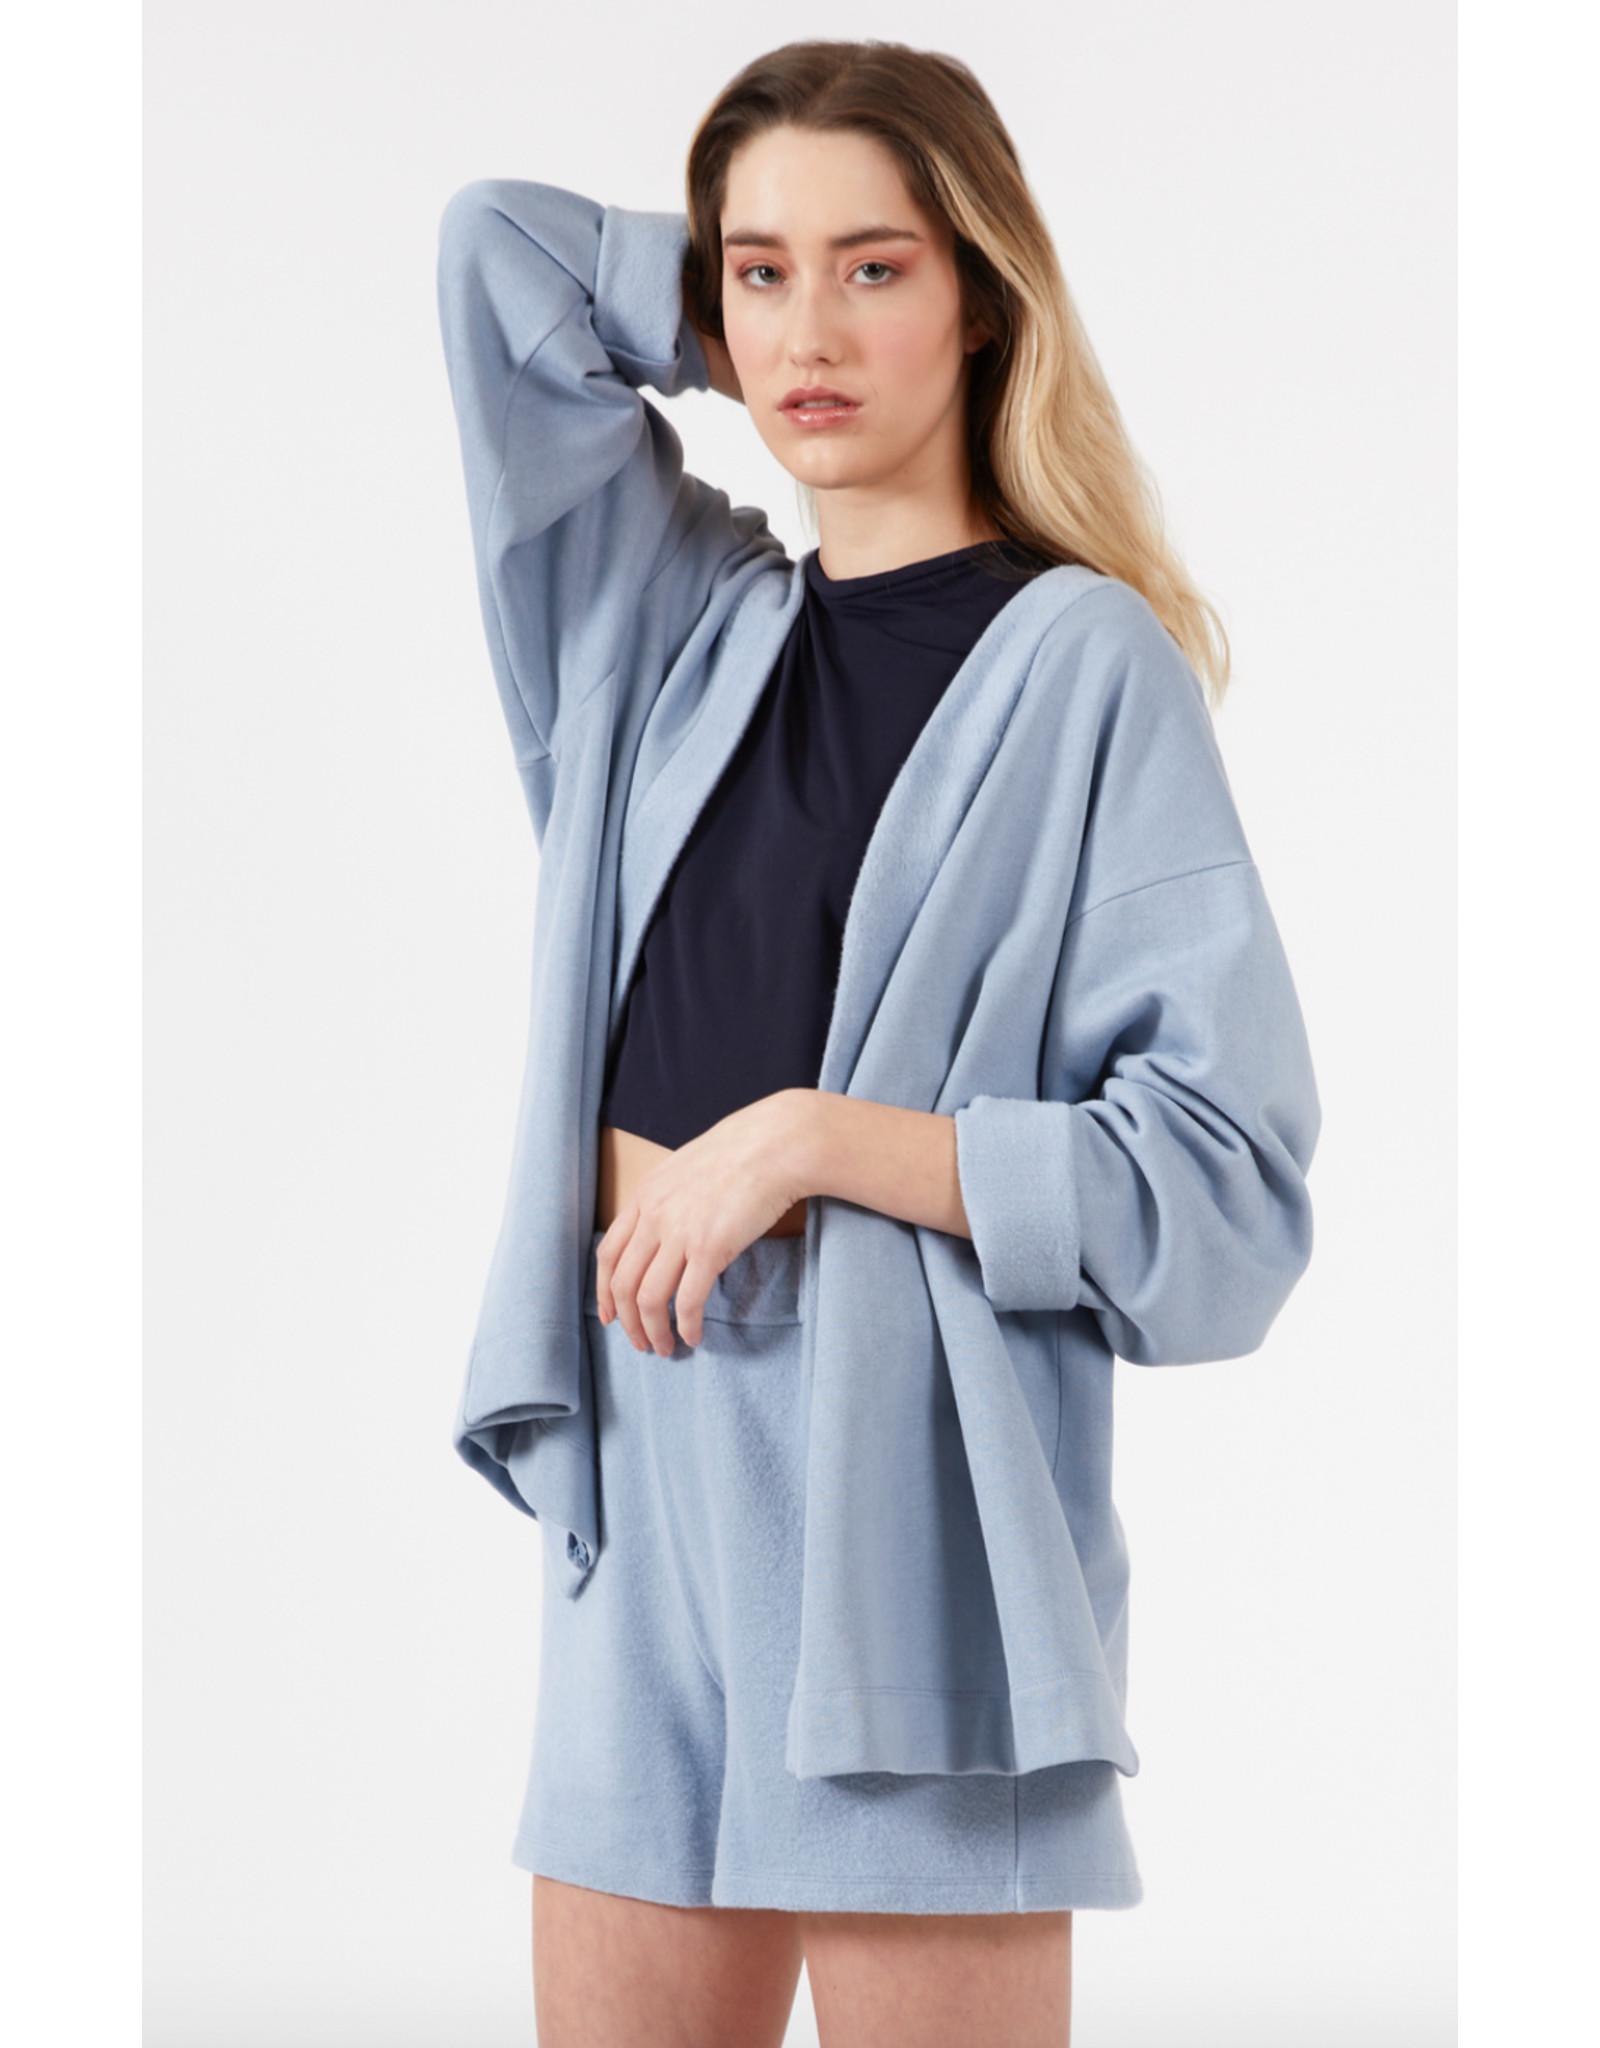 Fcapuano Short Jane coton ouaté bleu